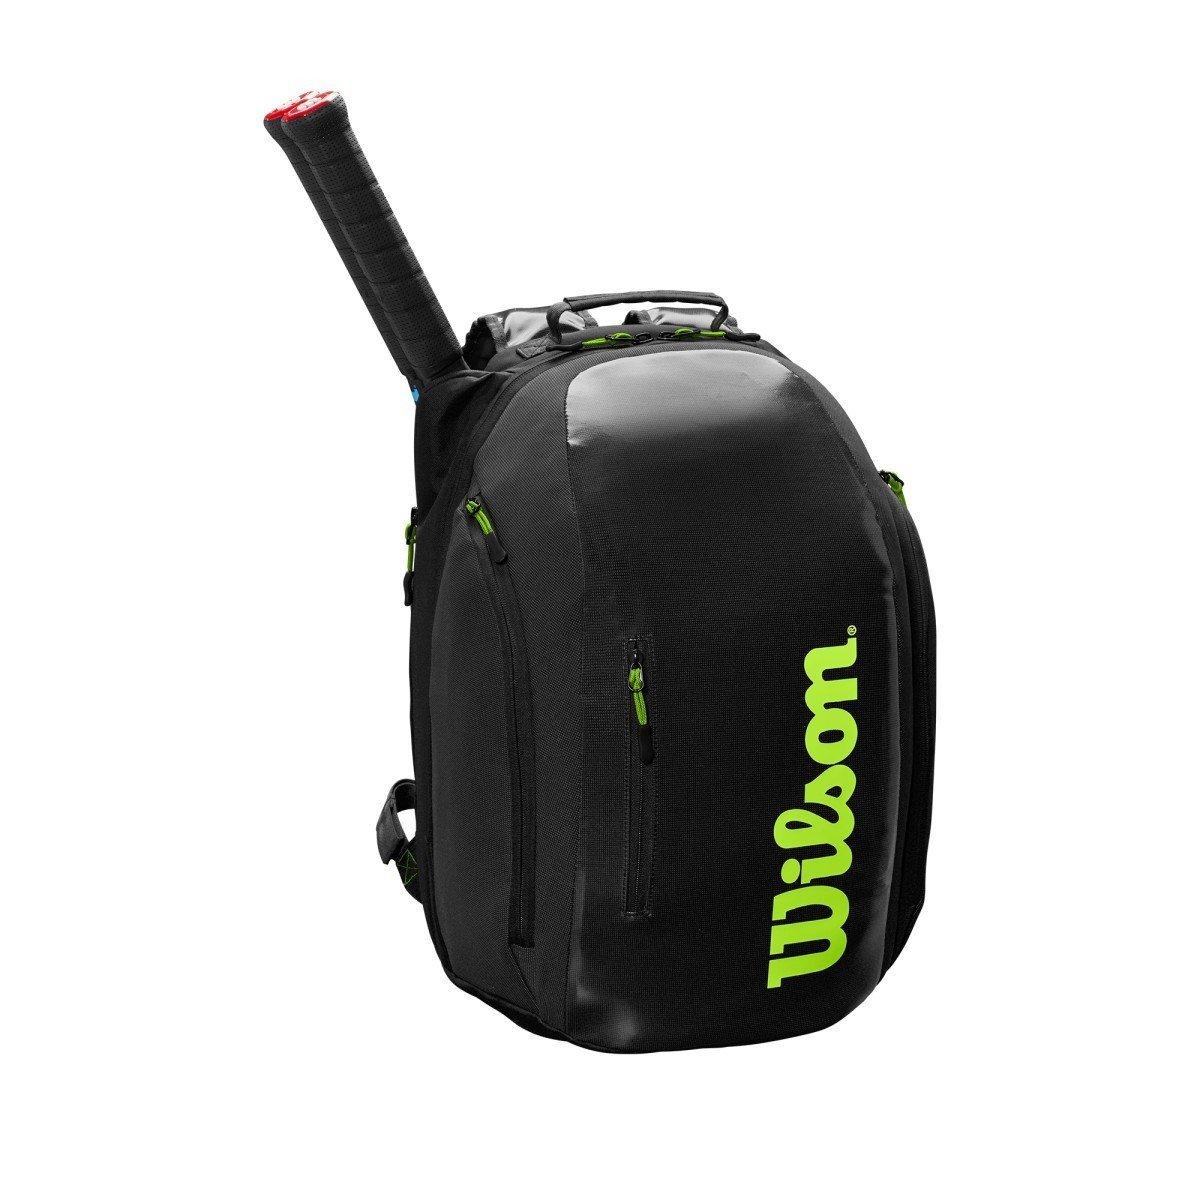 Wilson Tennis Backpack – Super Tour Backpack